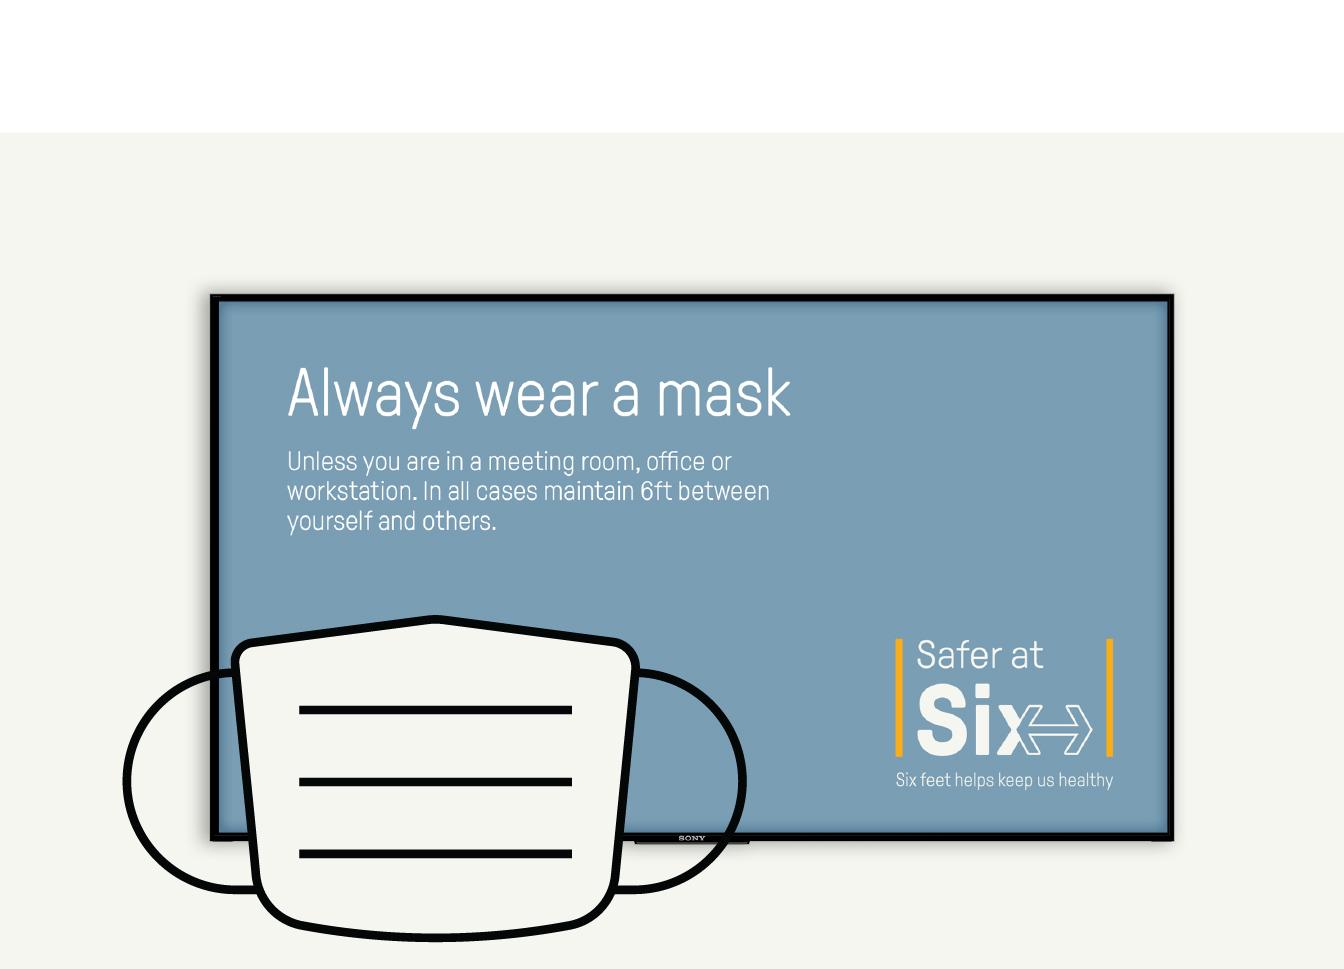 Safer at 6 mask poster.